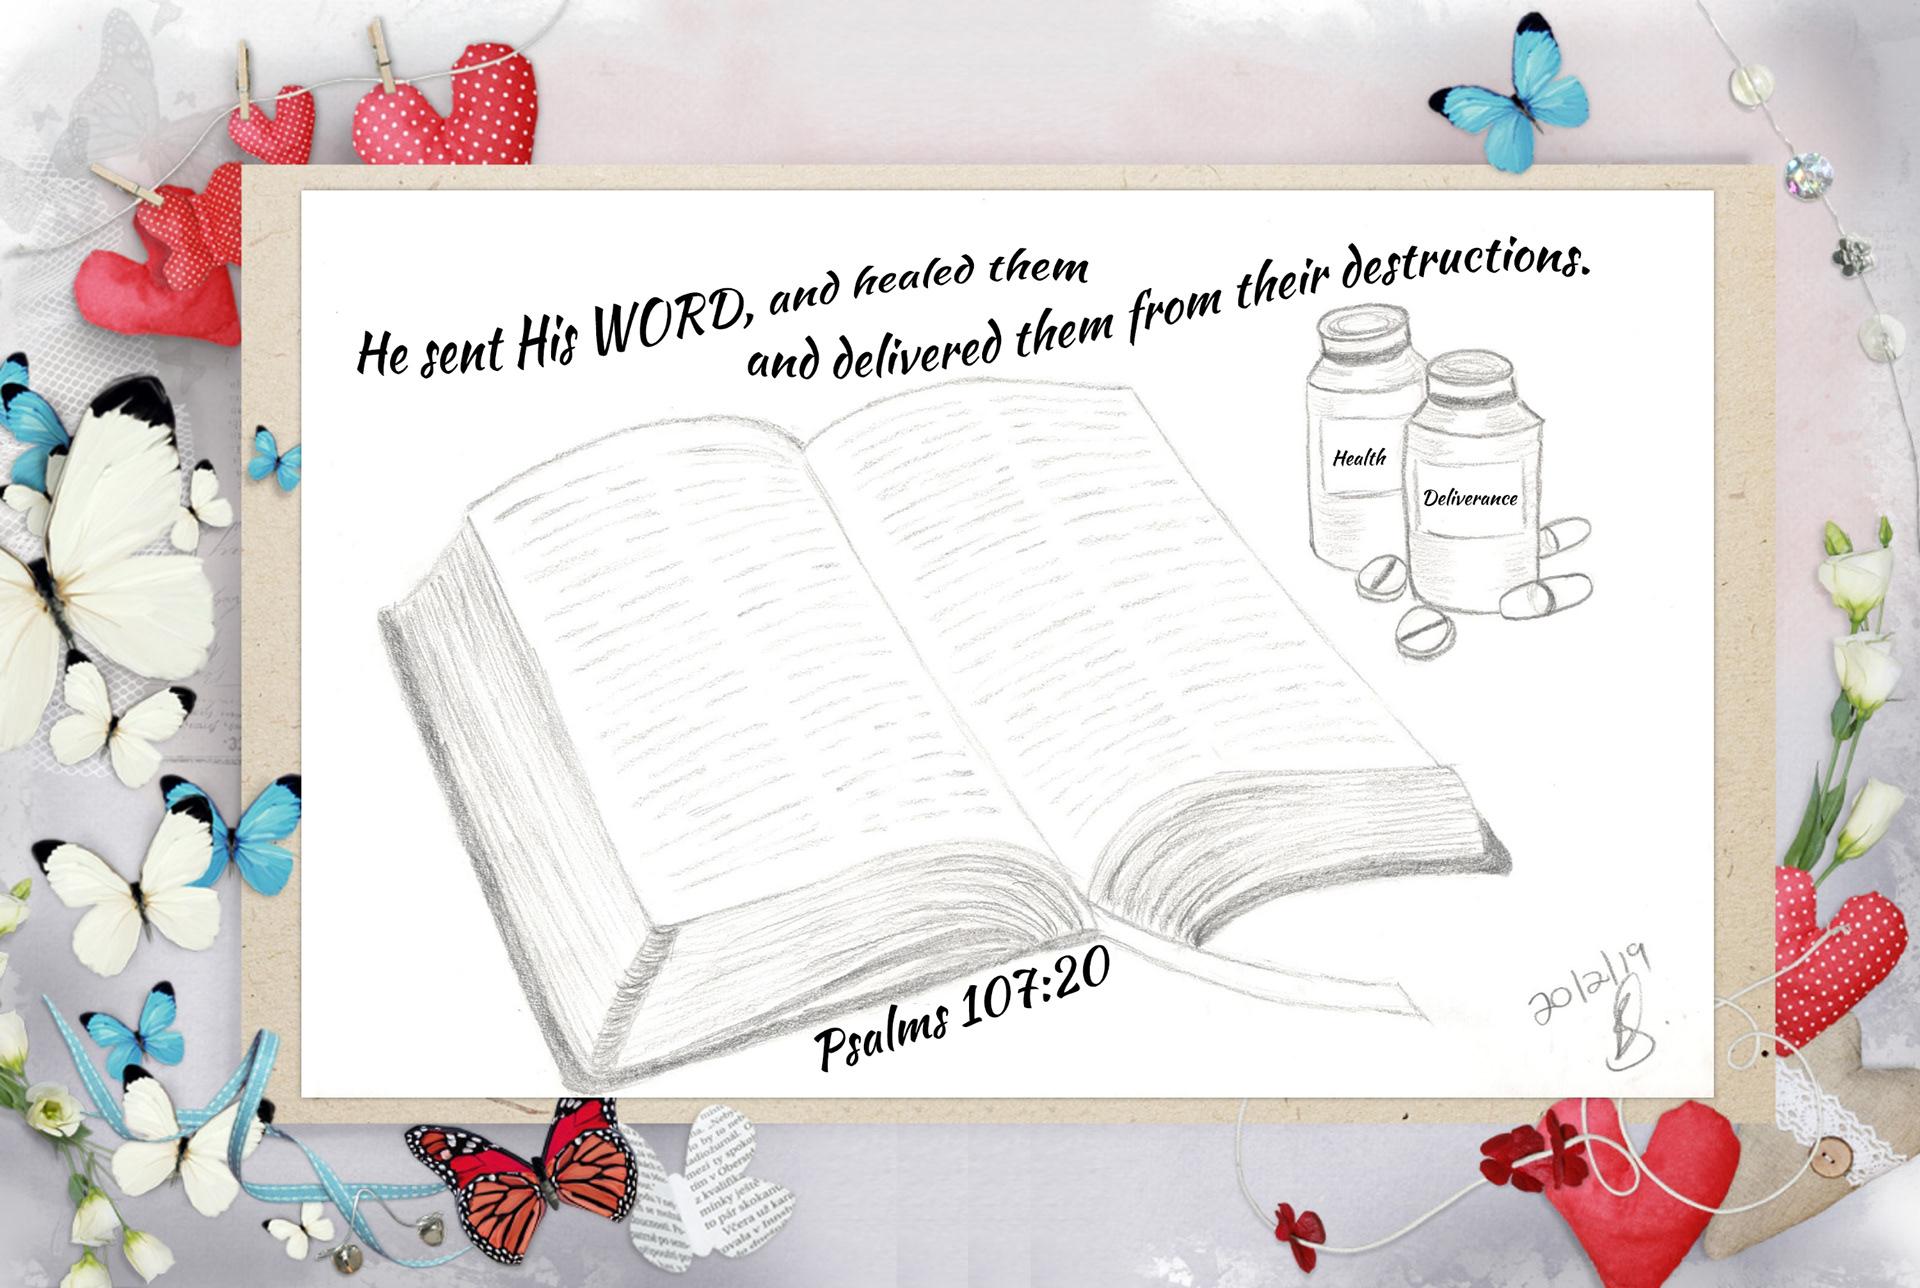 Psalm 107:20 on Behance